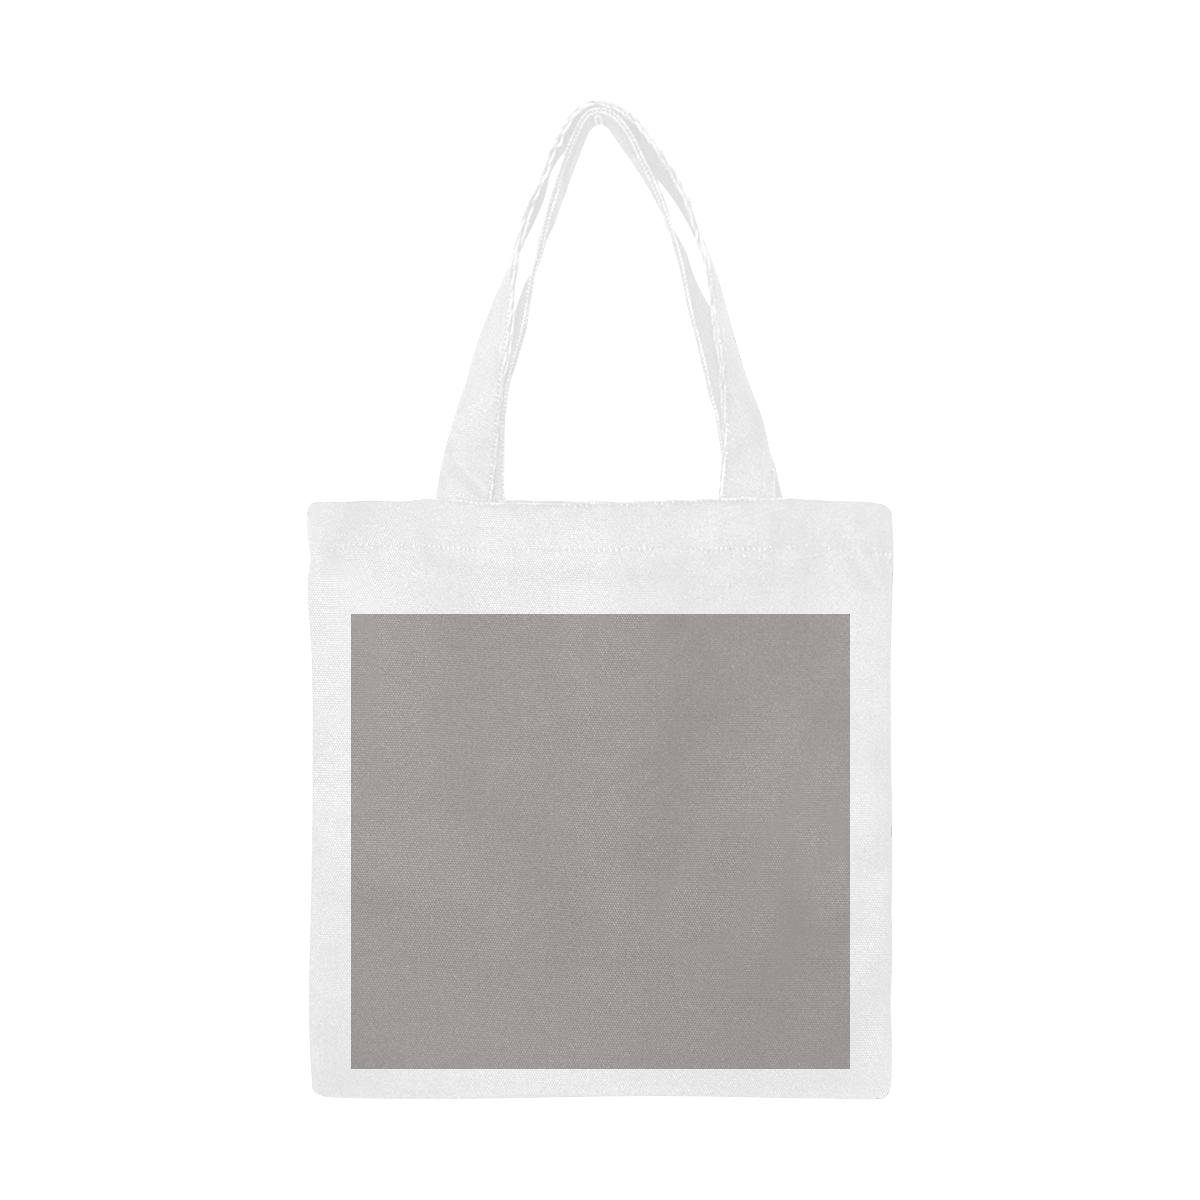 Ash Canvas Tote Bag/Small Canvas Tote Bag/Small (Model 1700)